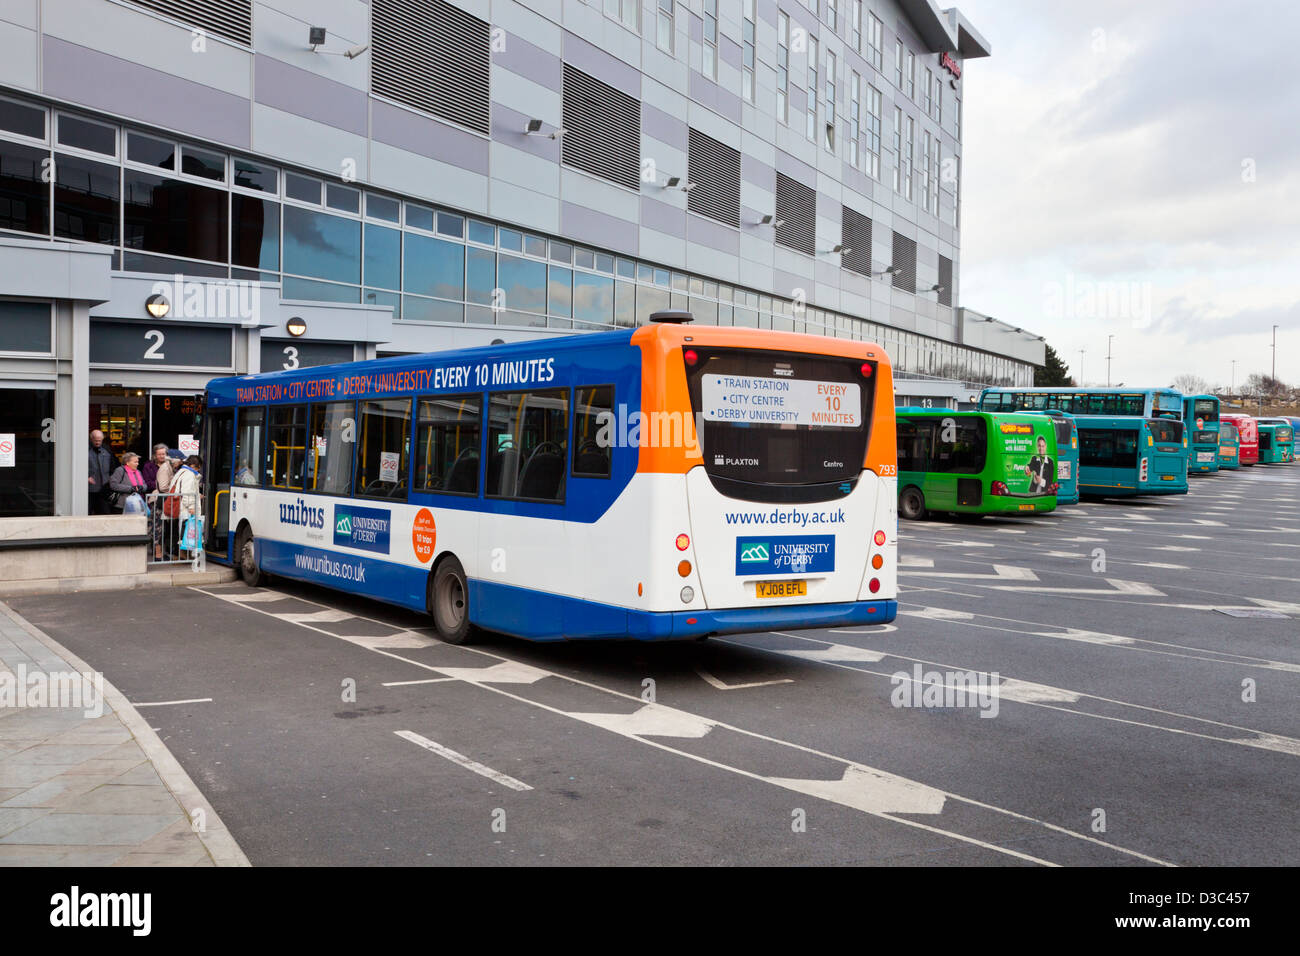 Derby bus station, England, UK - Stock Image